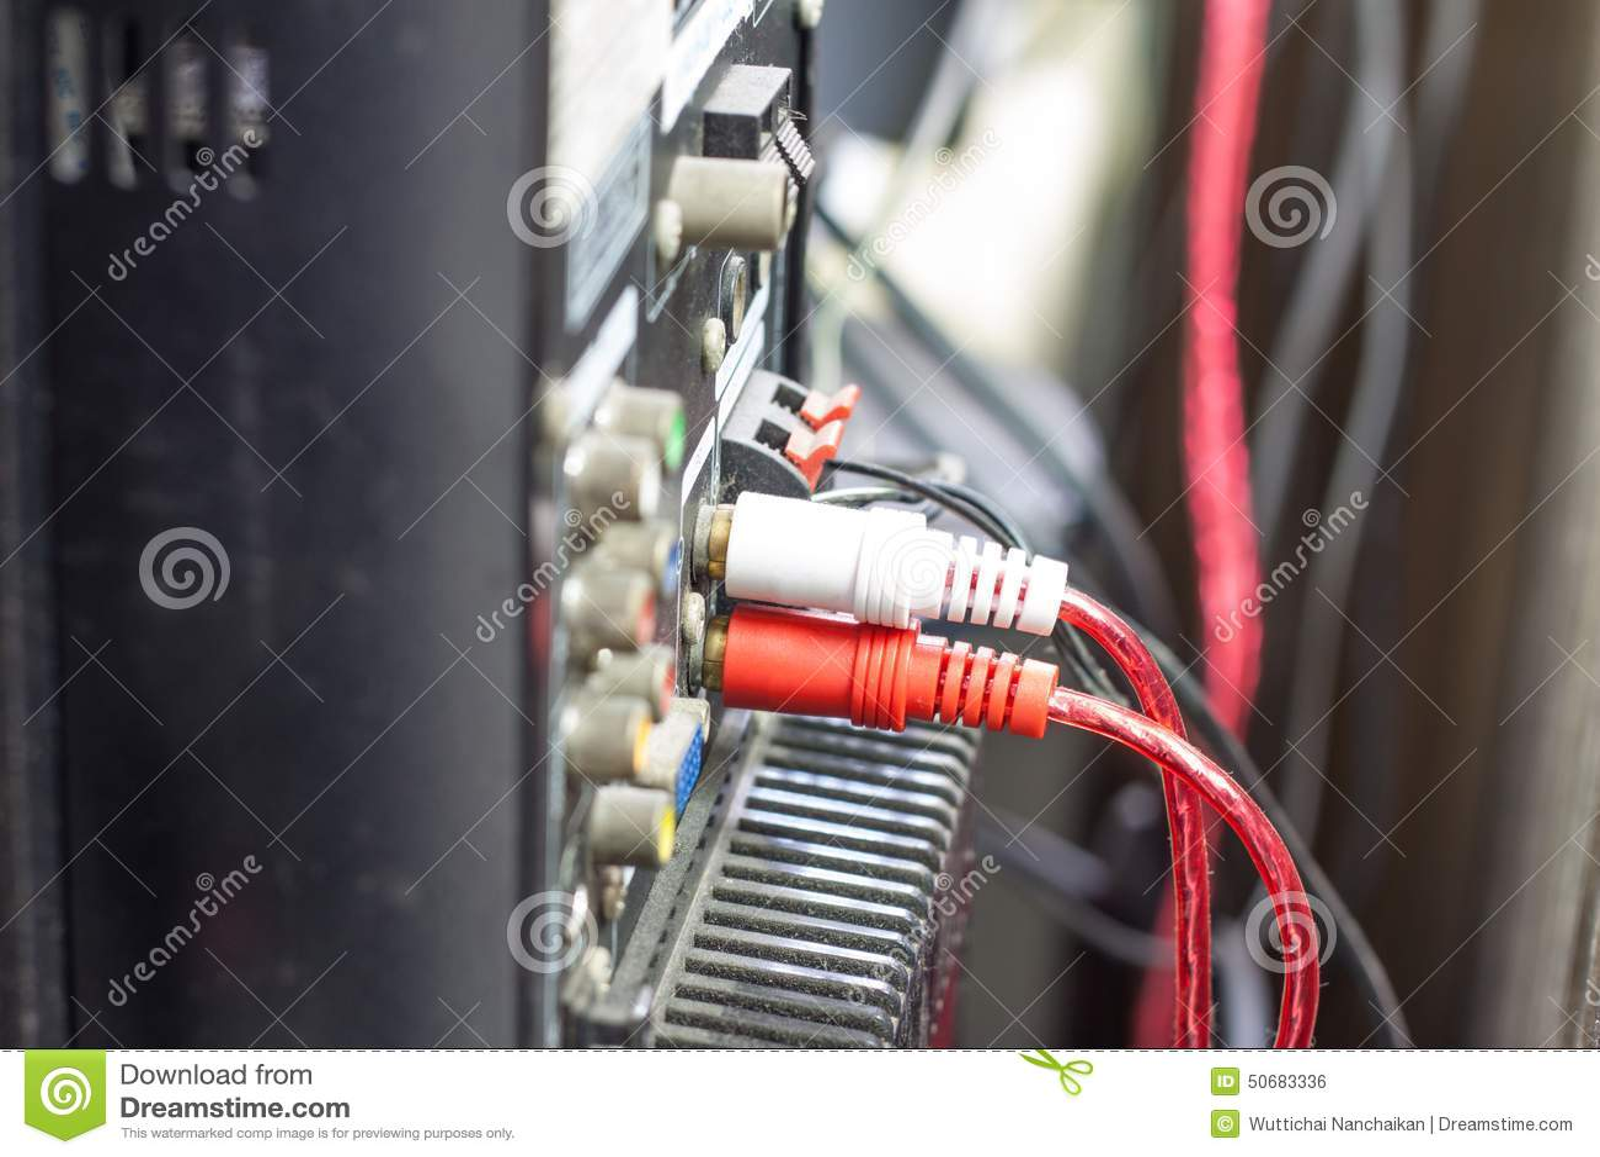 Download 音频球员的连接盘区 库存照片. 图片 包括有 backarrow, 连接数, 茄子, 立体声, 特写镜头 - 50683336